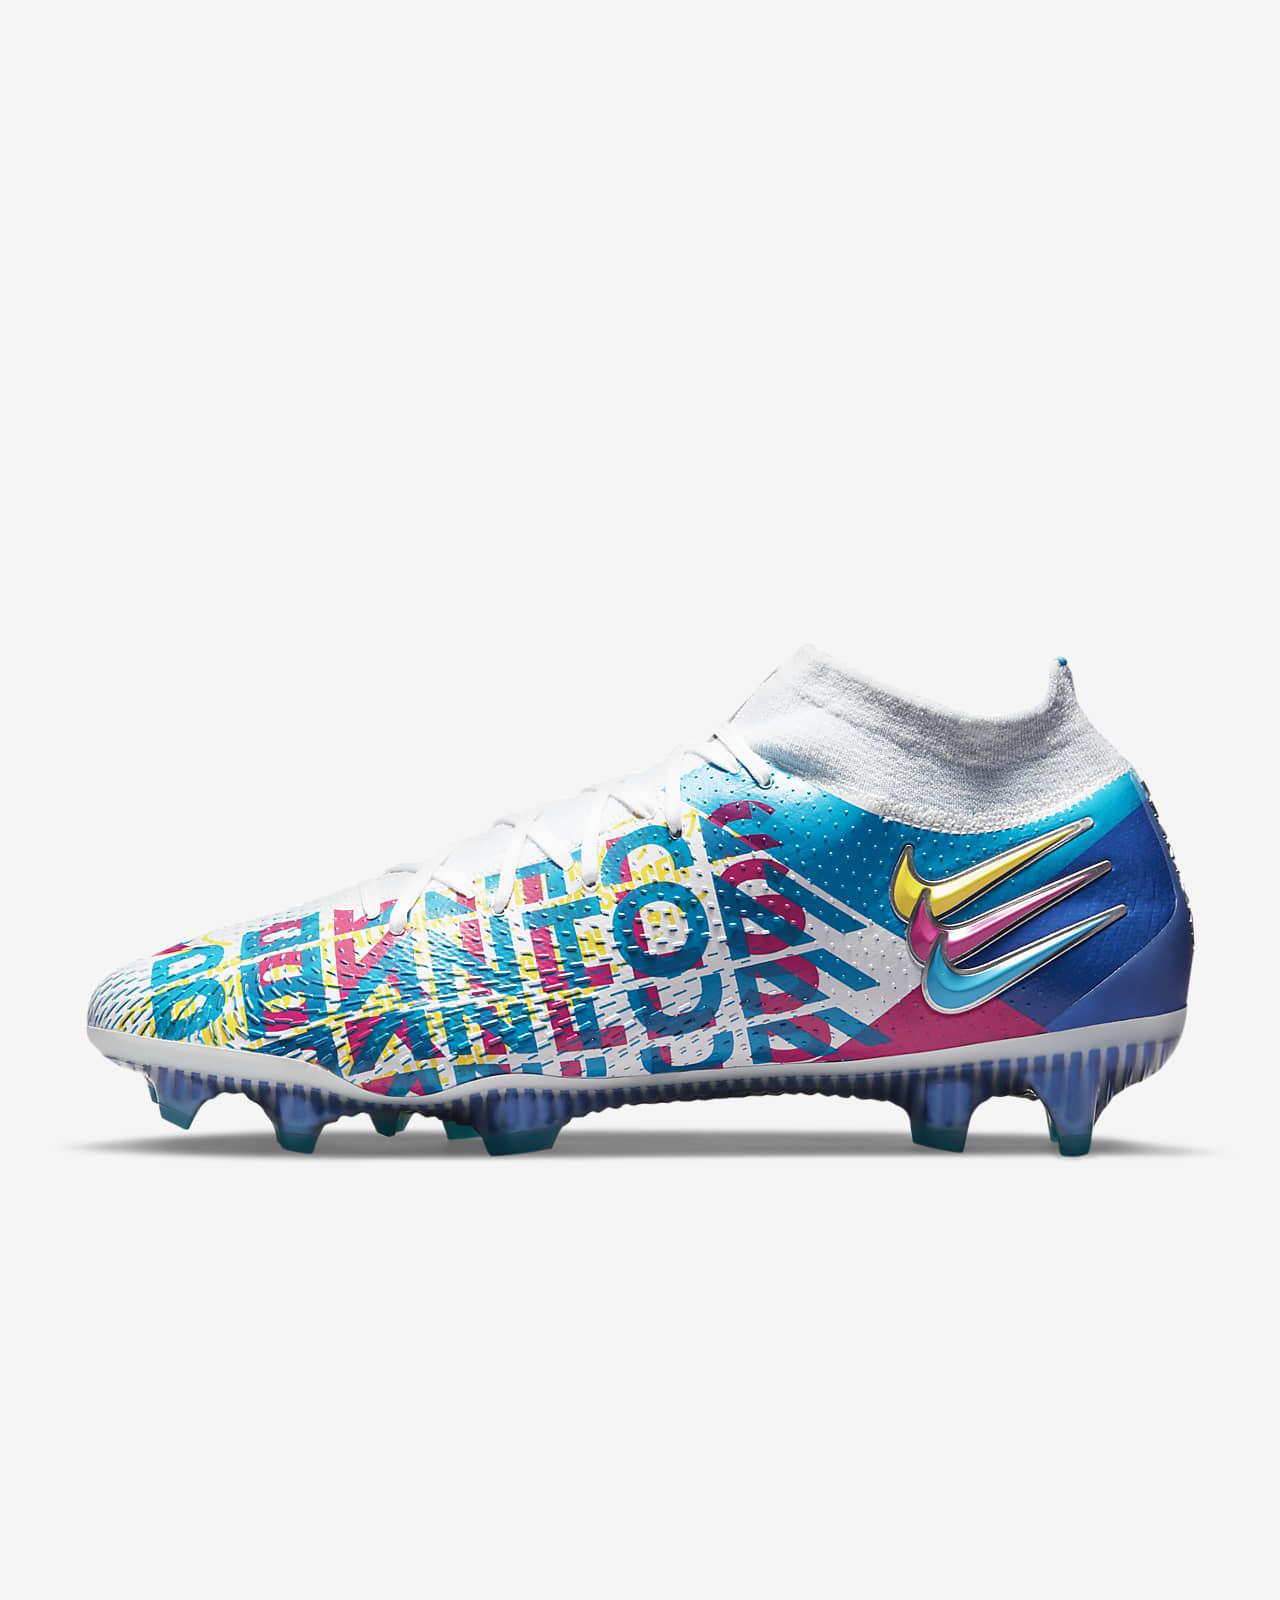 Nike Phantom GT Elite Dynamic Fit 3D FG Firm-Ground Football Boot